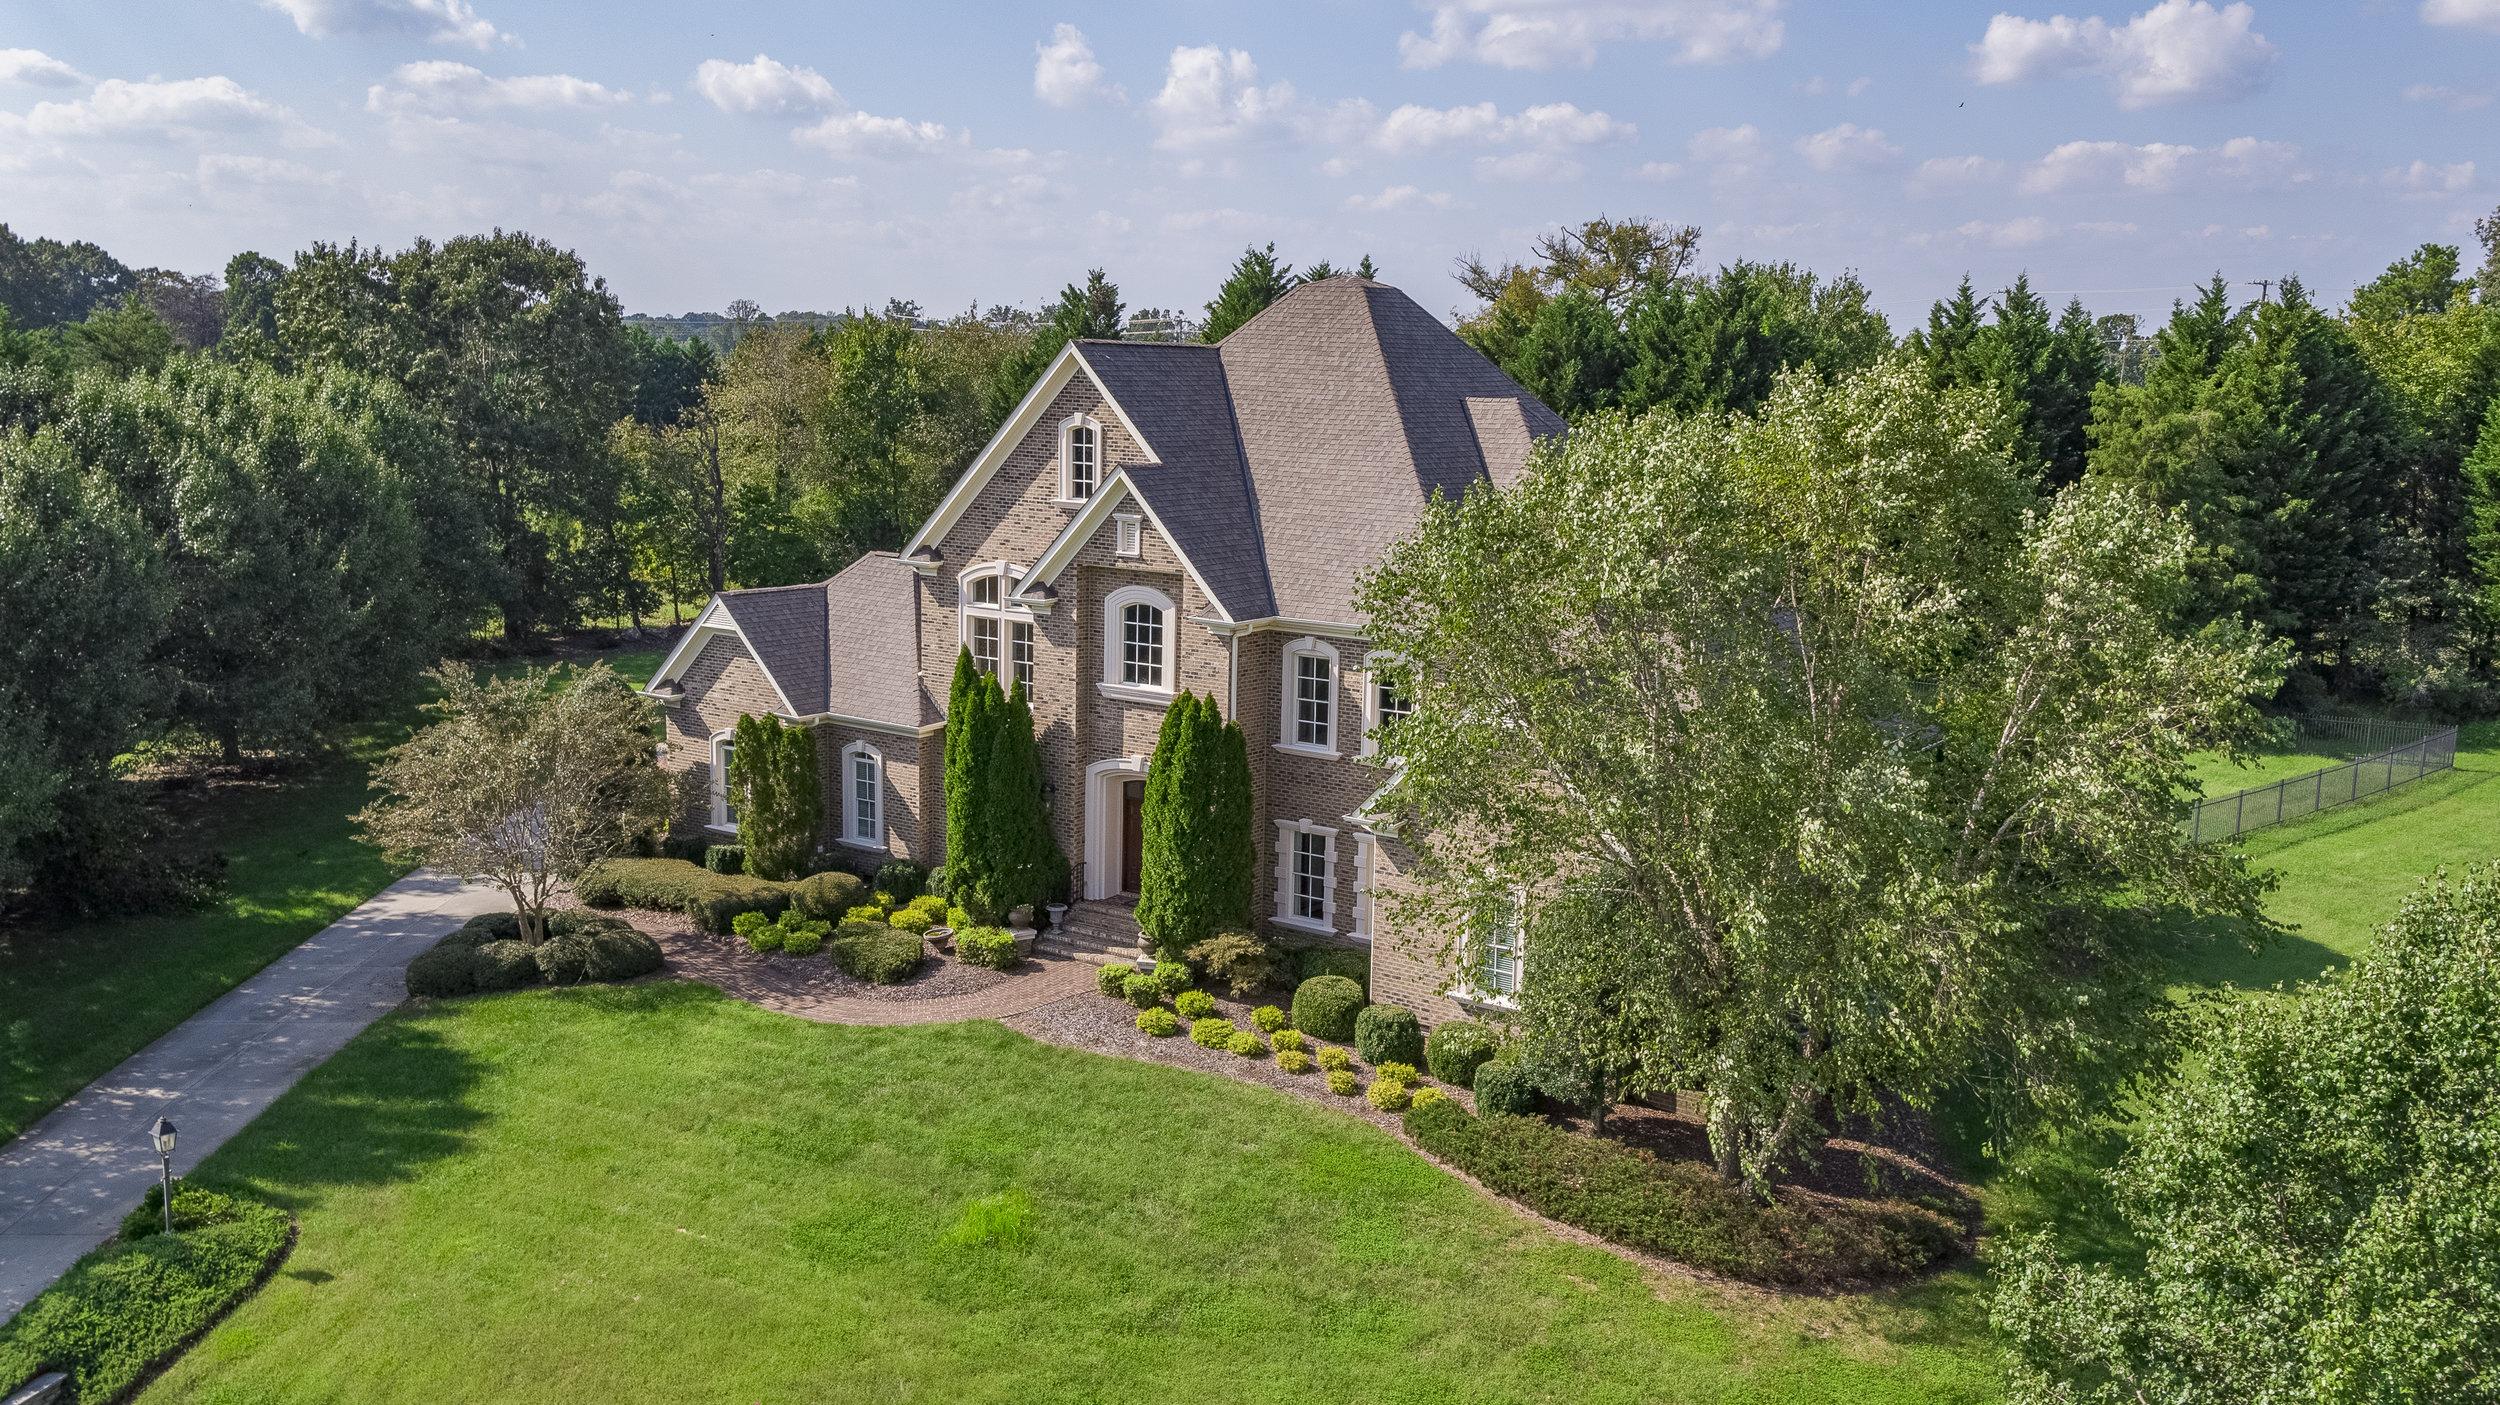 real-estate-photography-drone-photographer-drone-greensboro-nc-triad-213.jpg